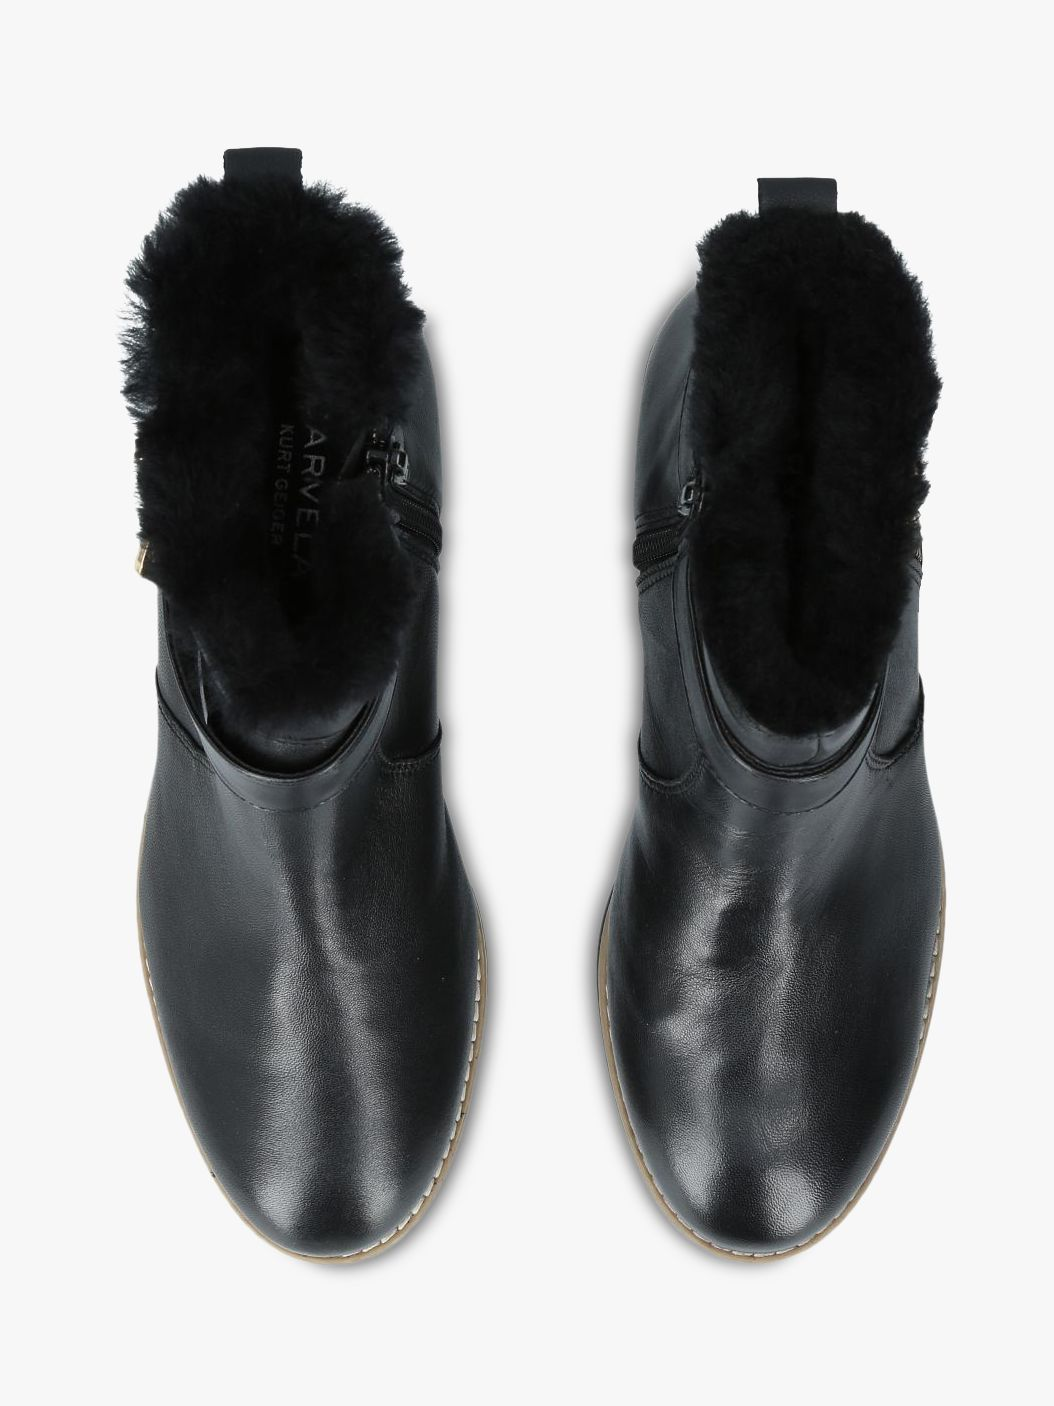 Carvela Scout Buckle Ankle Boots, Black